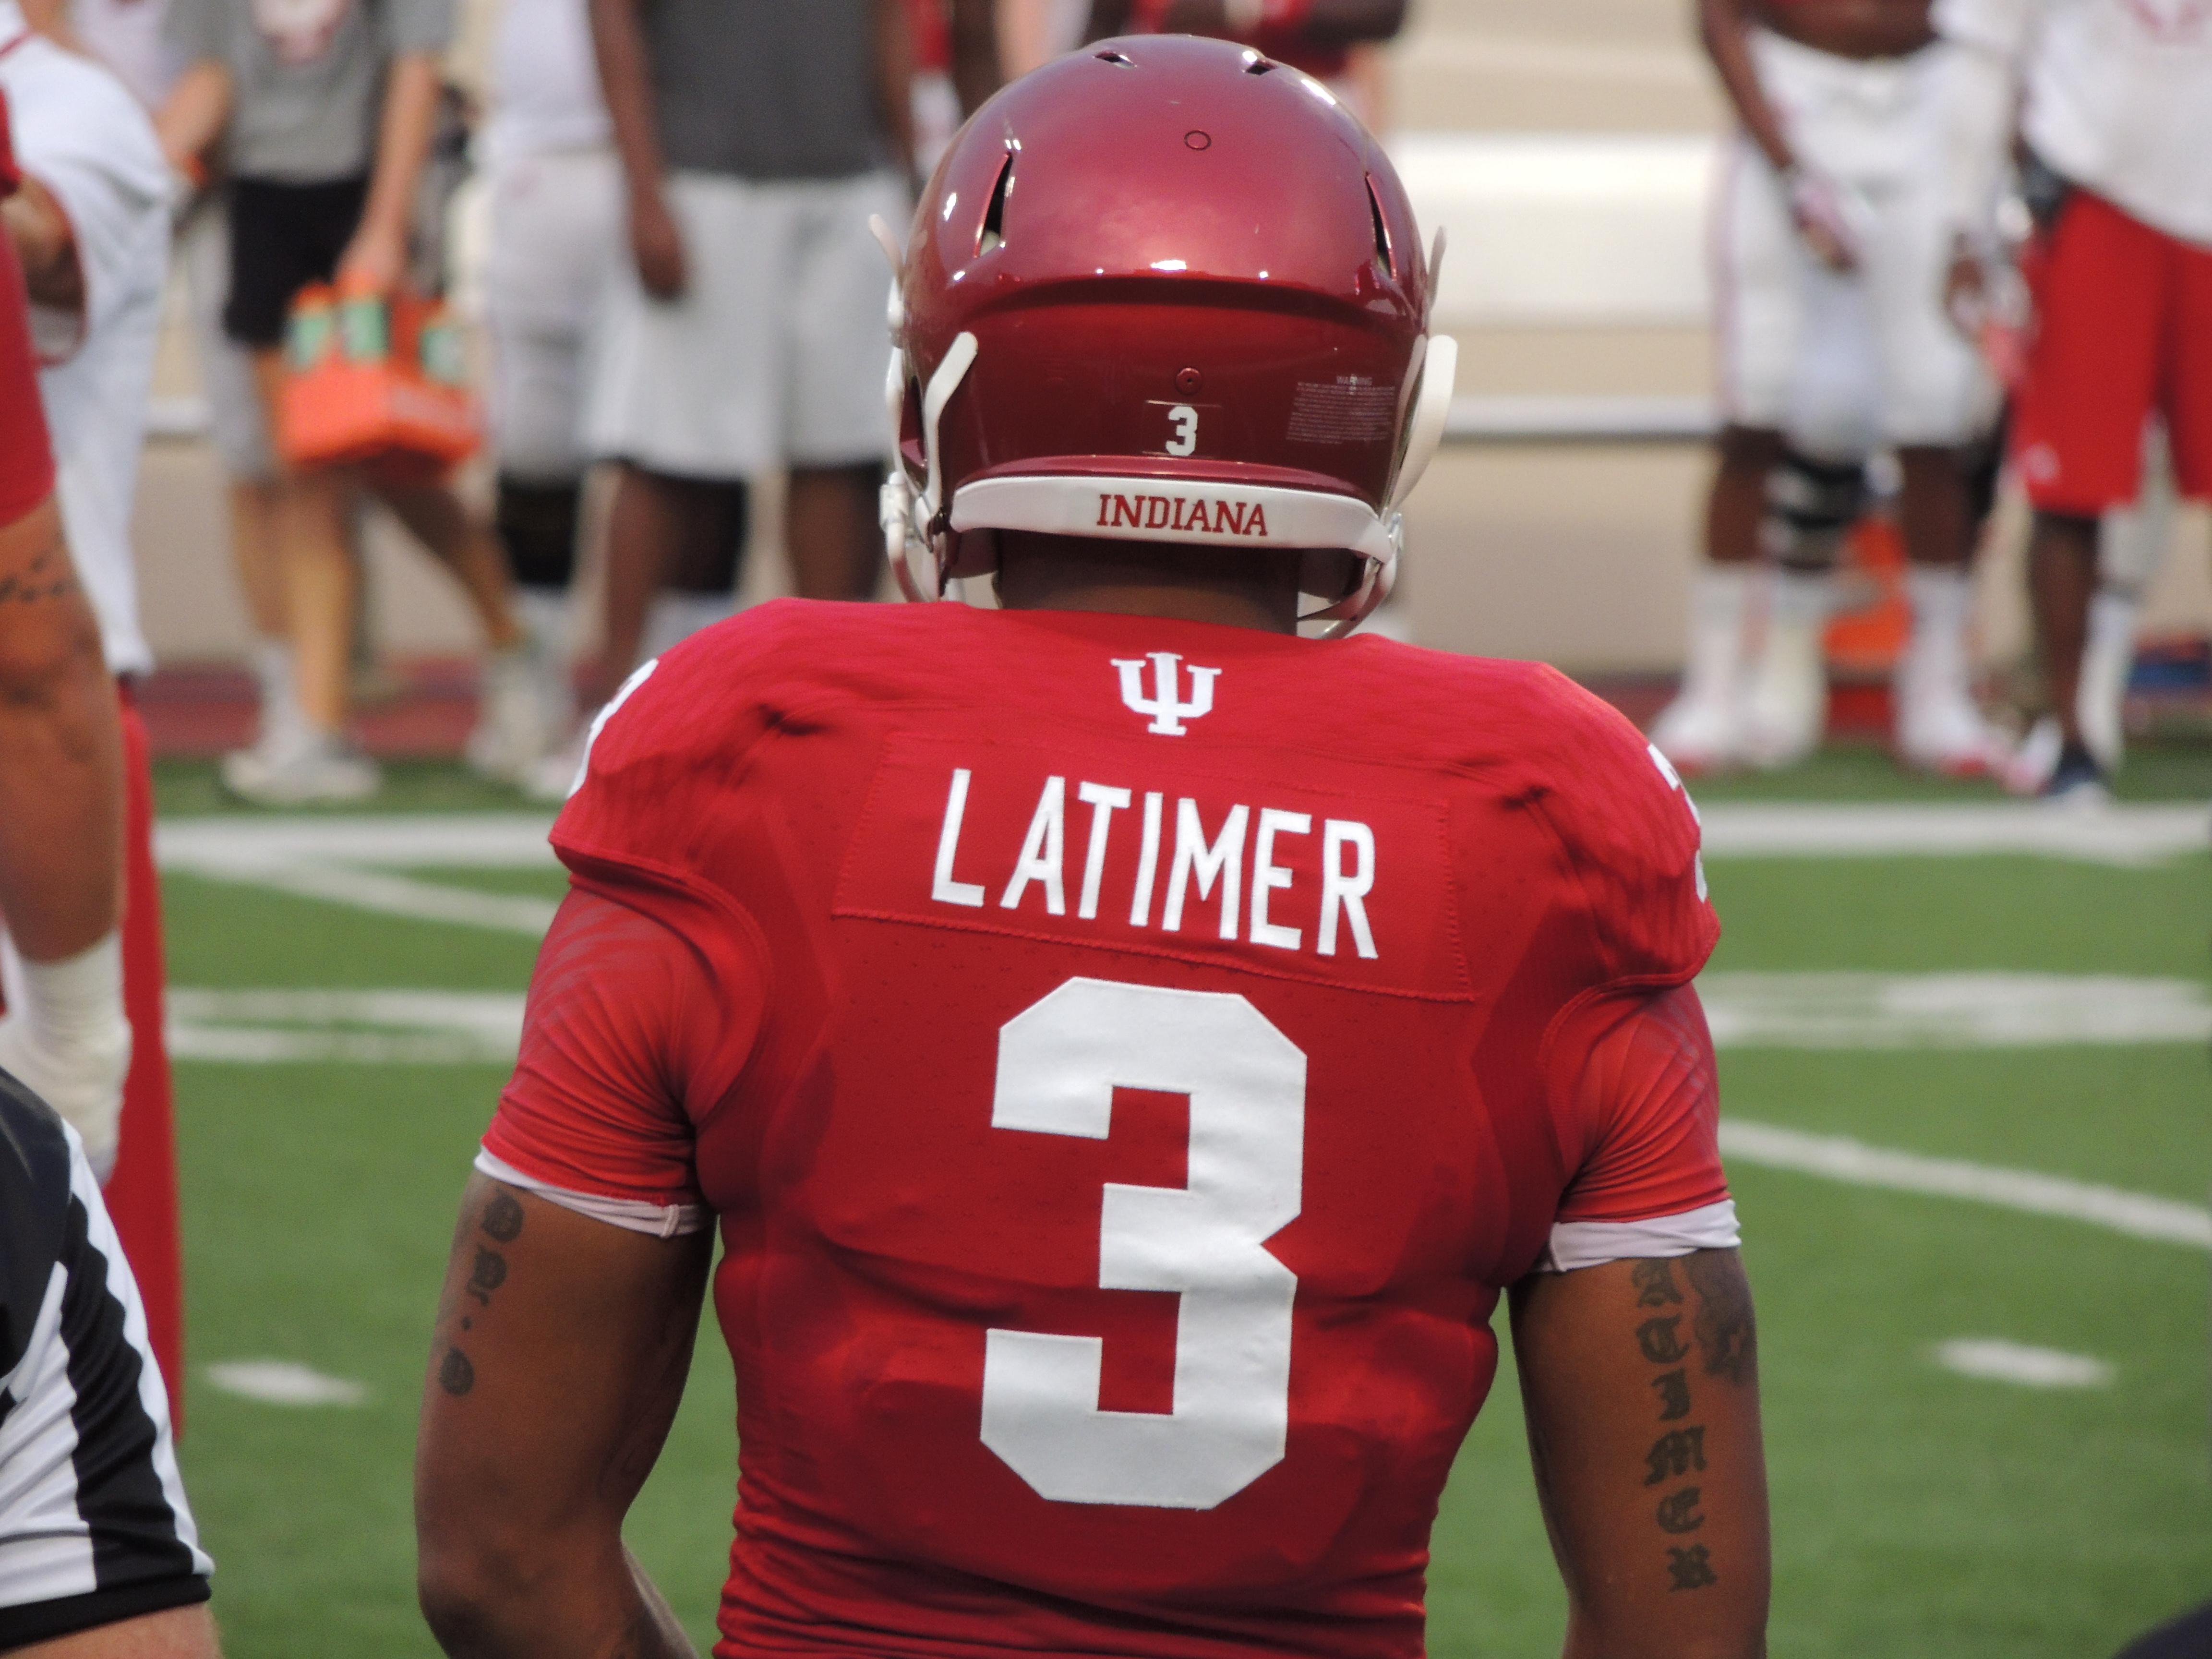 Hoosiers' Cody Latimer benefits from career audible